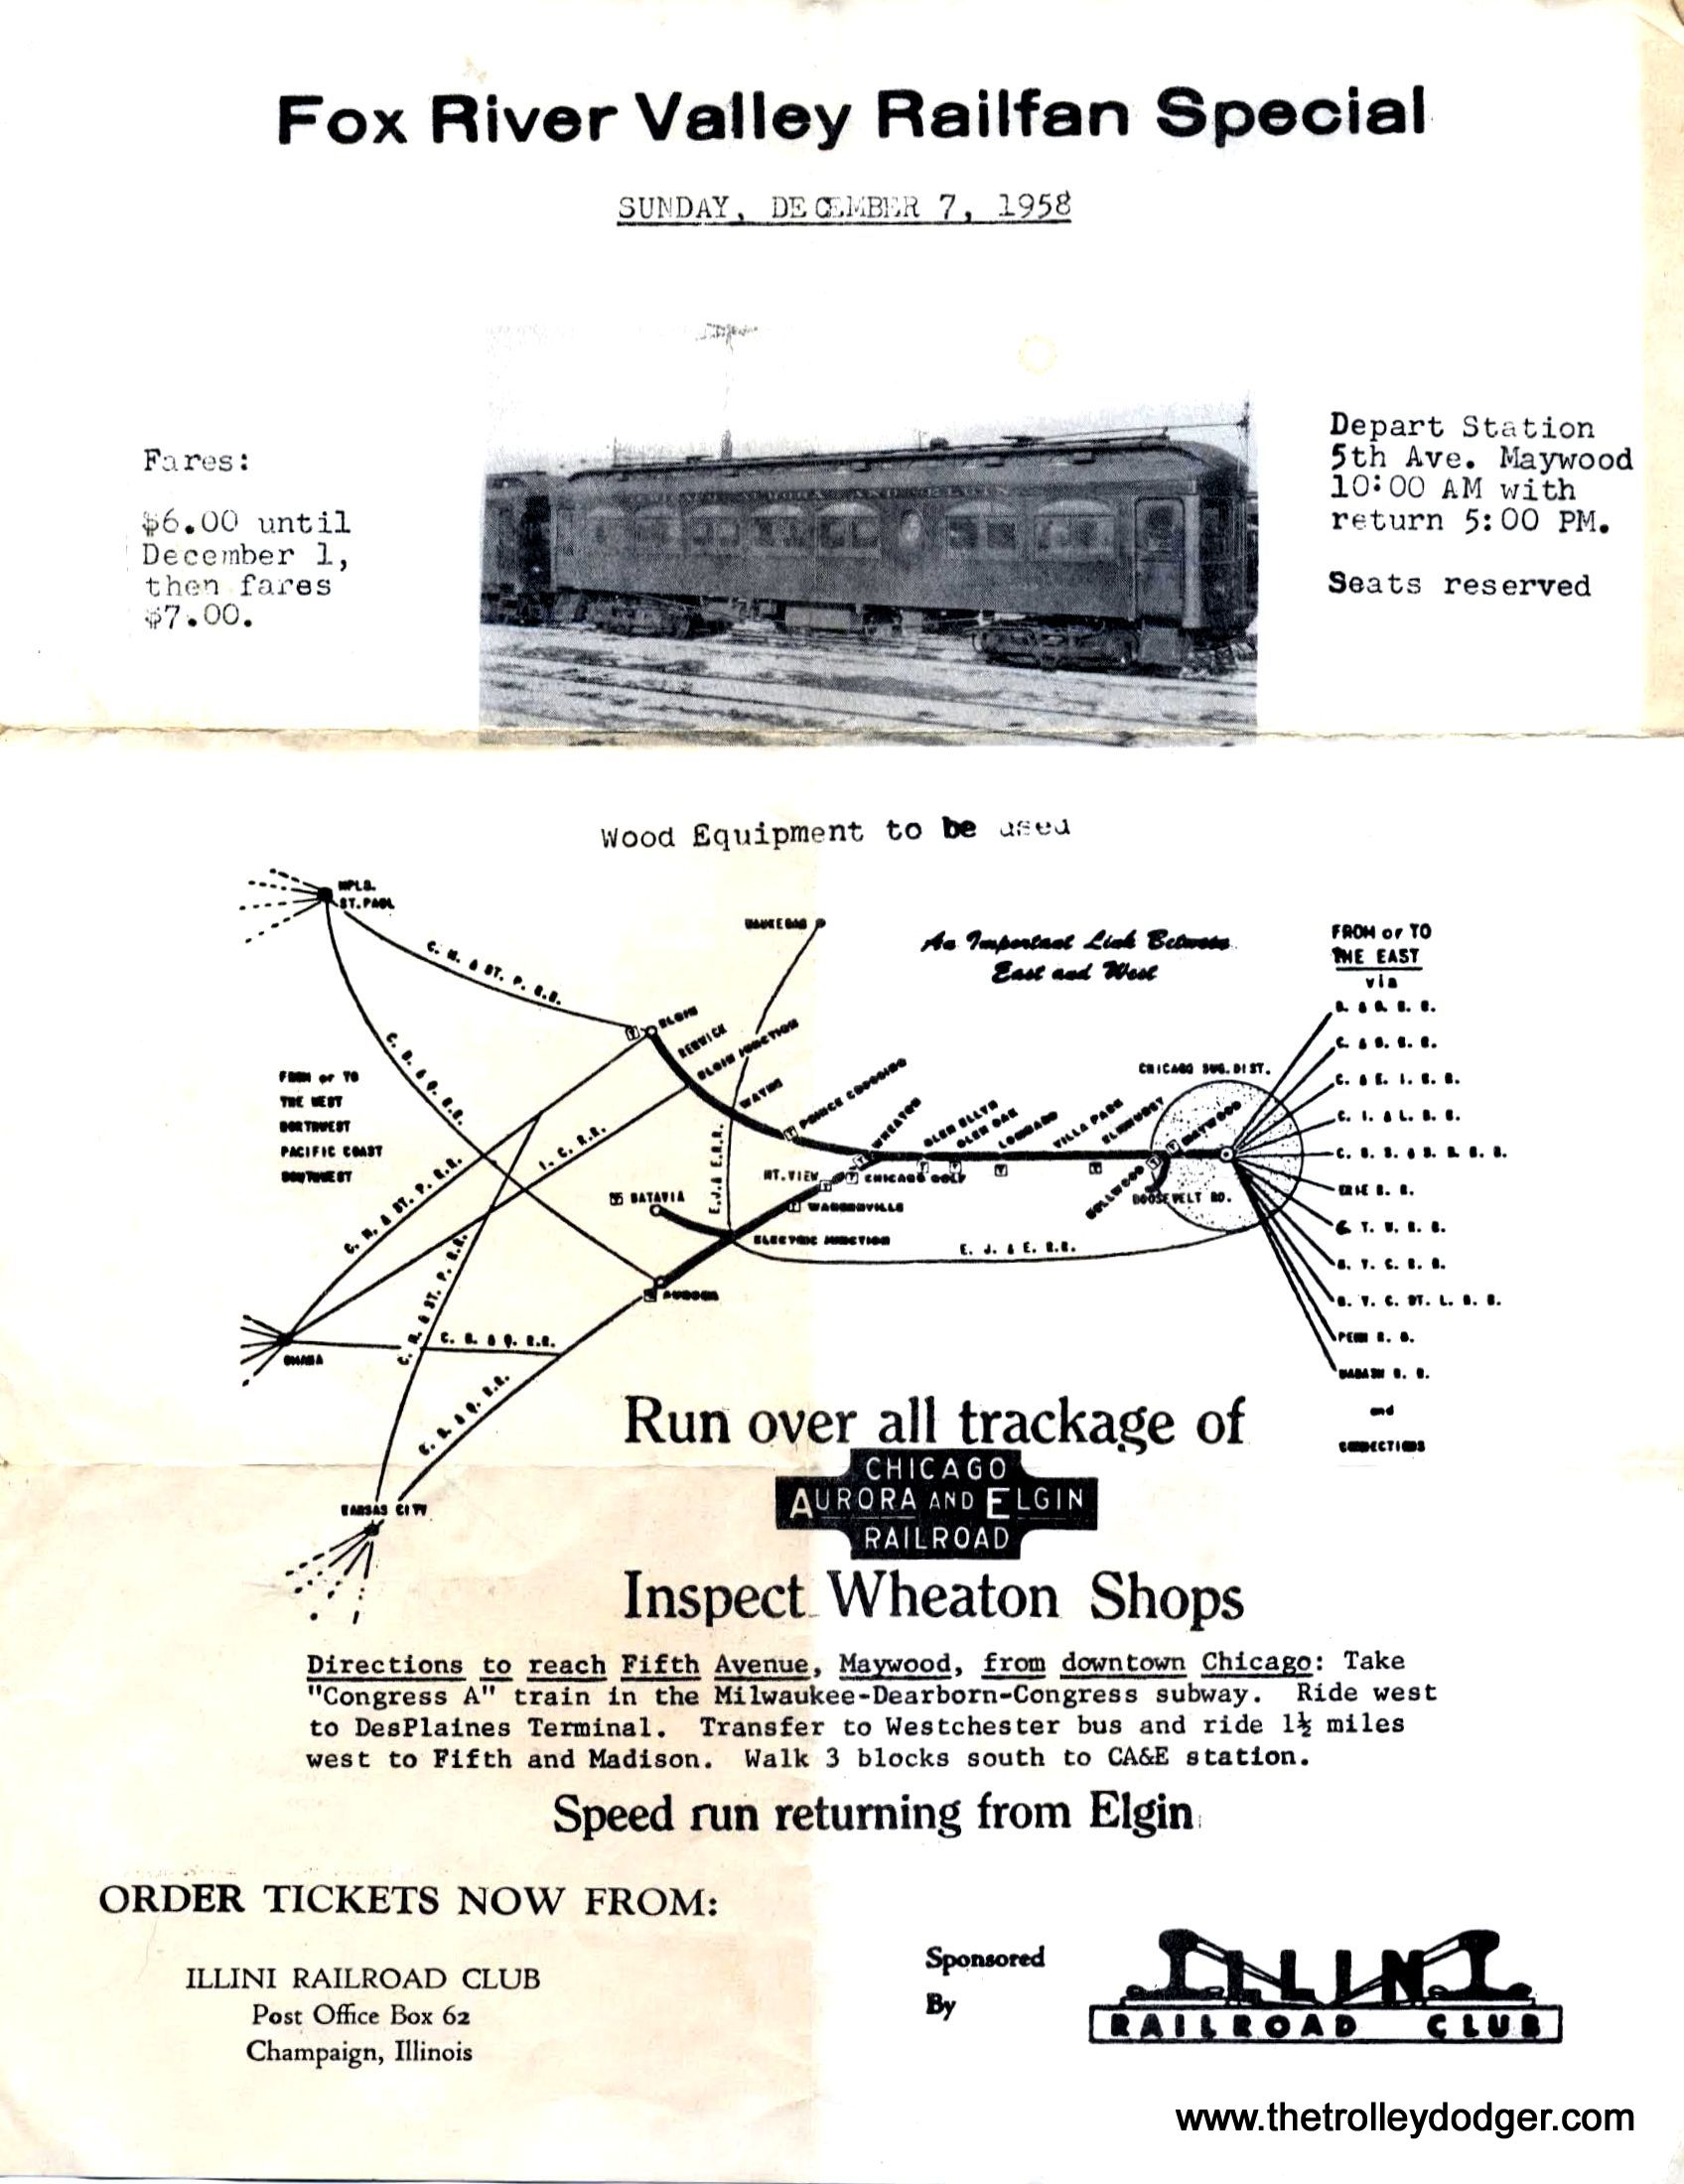 cae151?w=665&h=863 illinois prairie path the trolley dodger Aurora Borealis Diagram at crackthecode.co